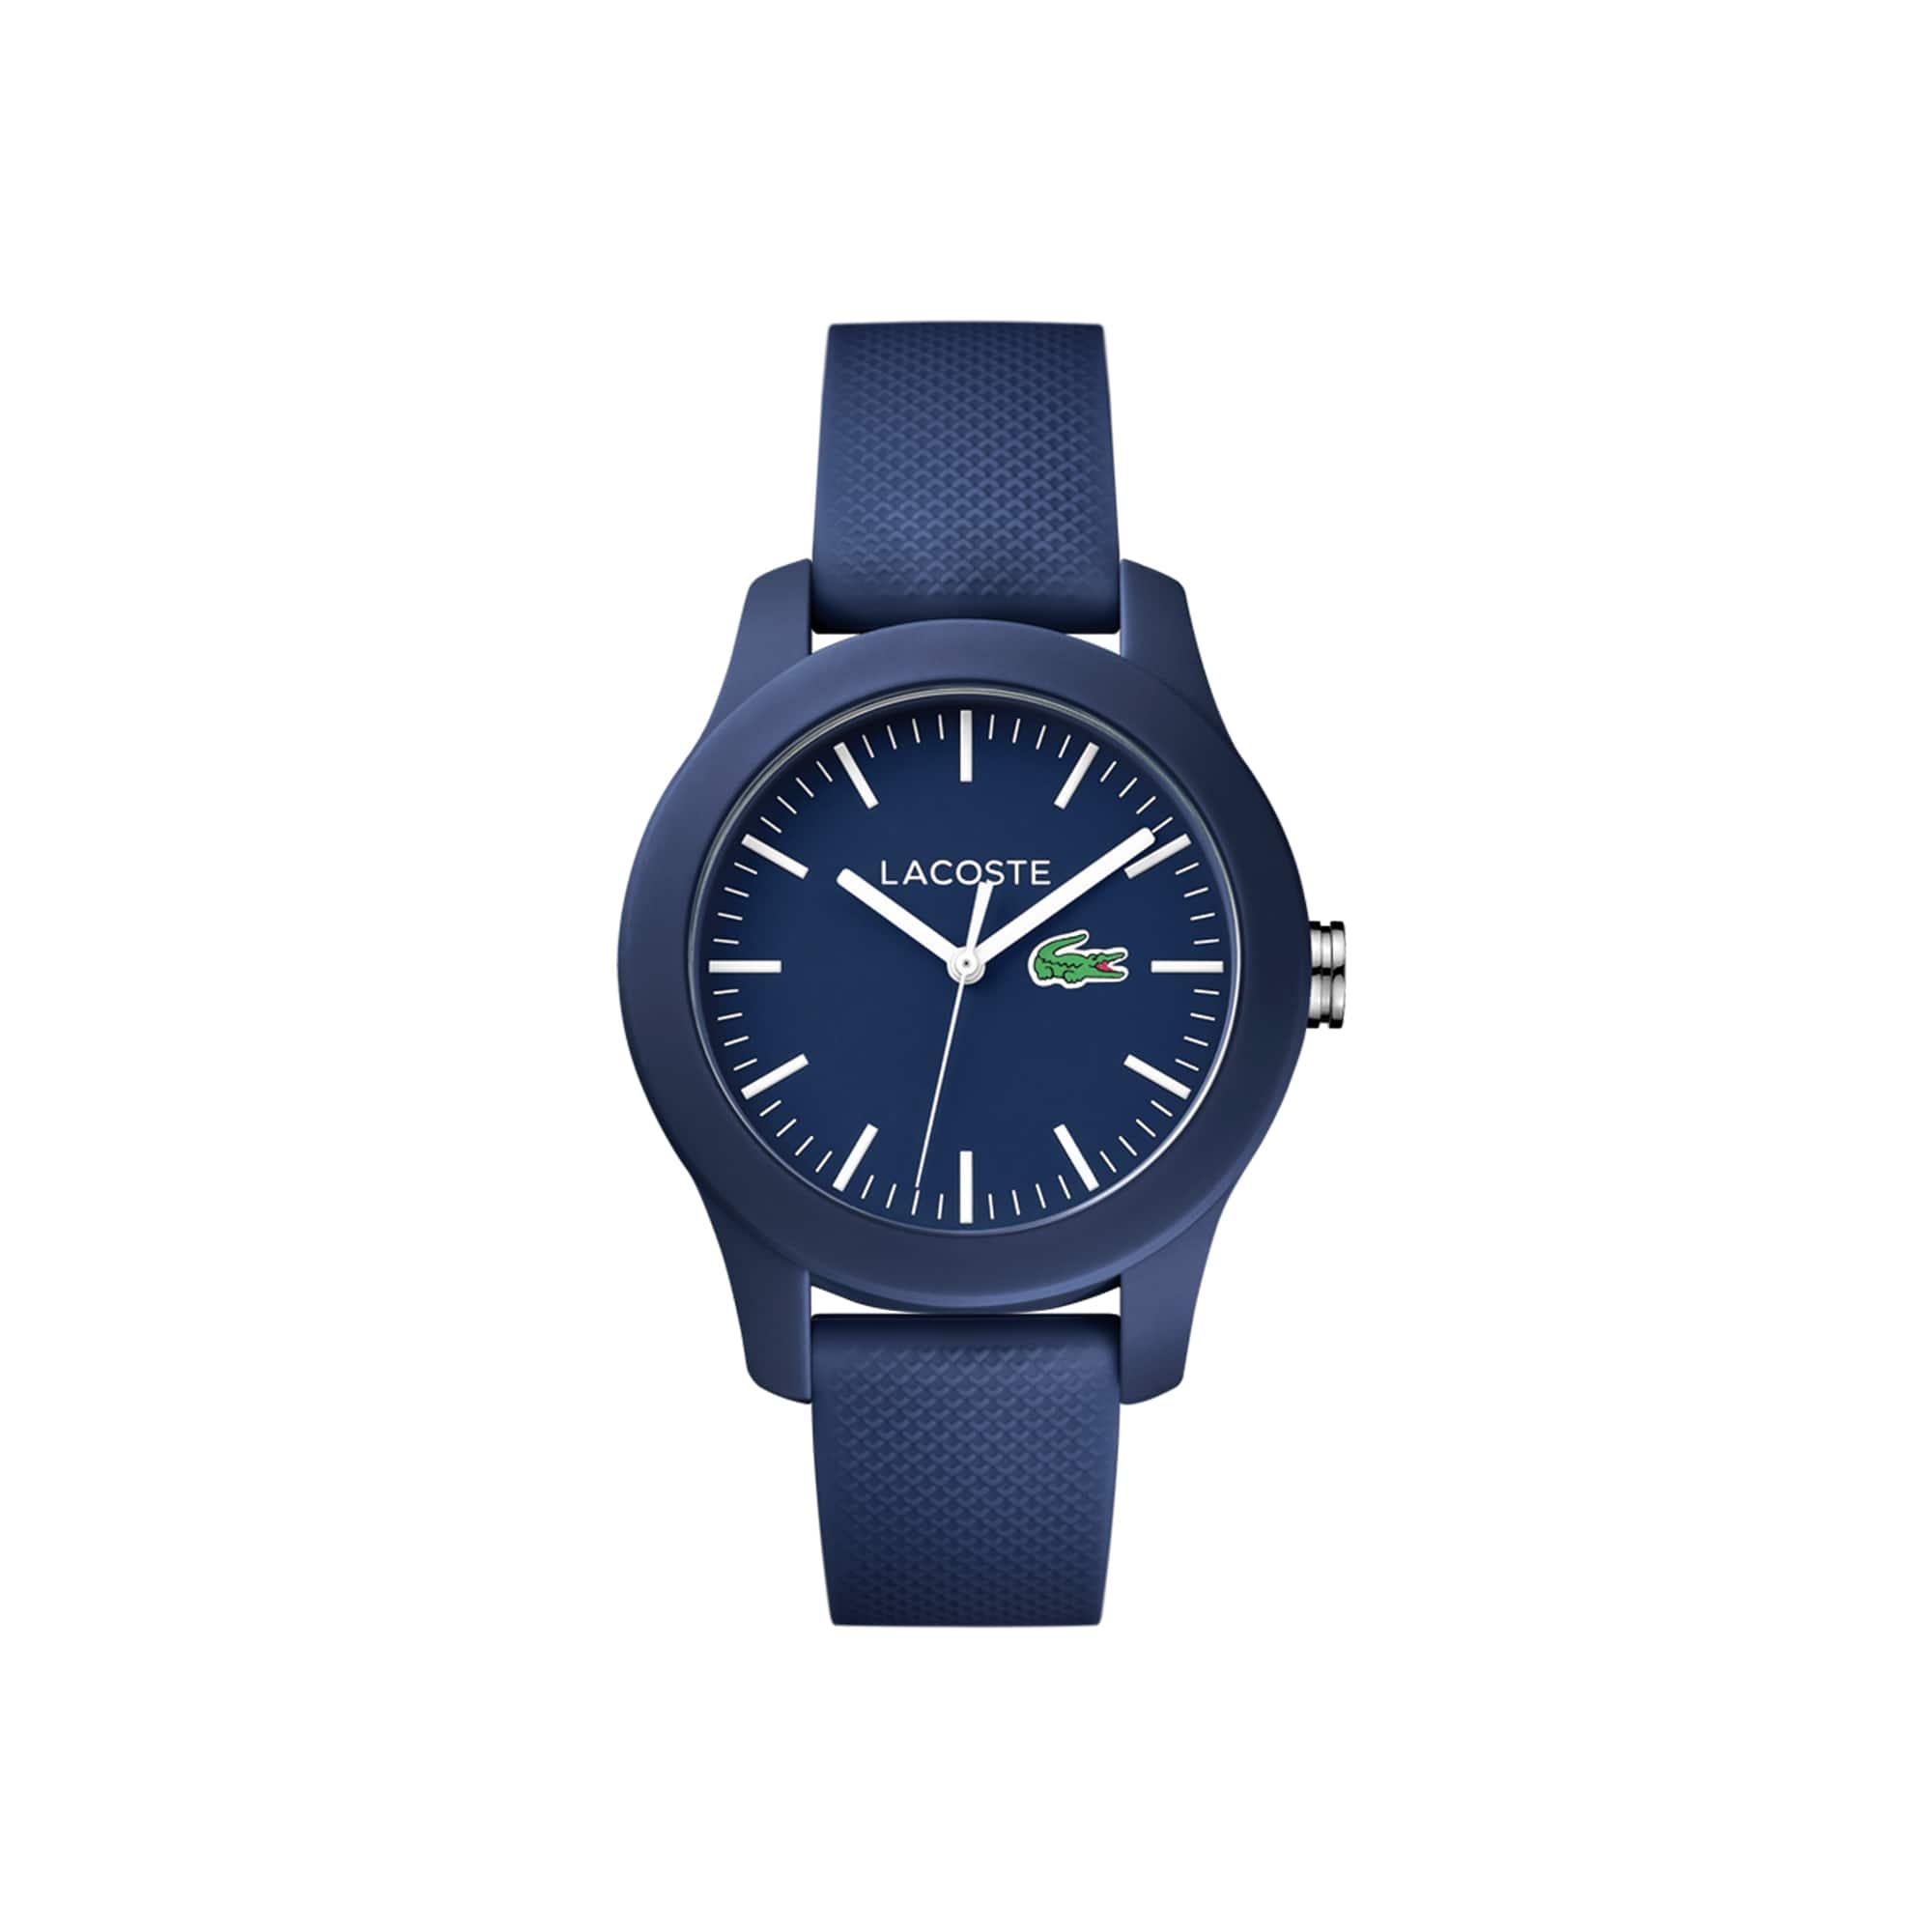 Damenuhr LACOSTE12.12 mit blauem Silikon Armband